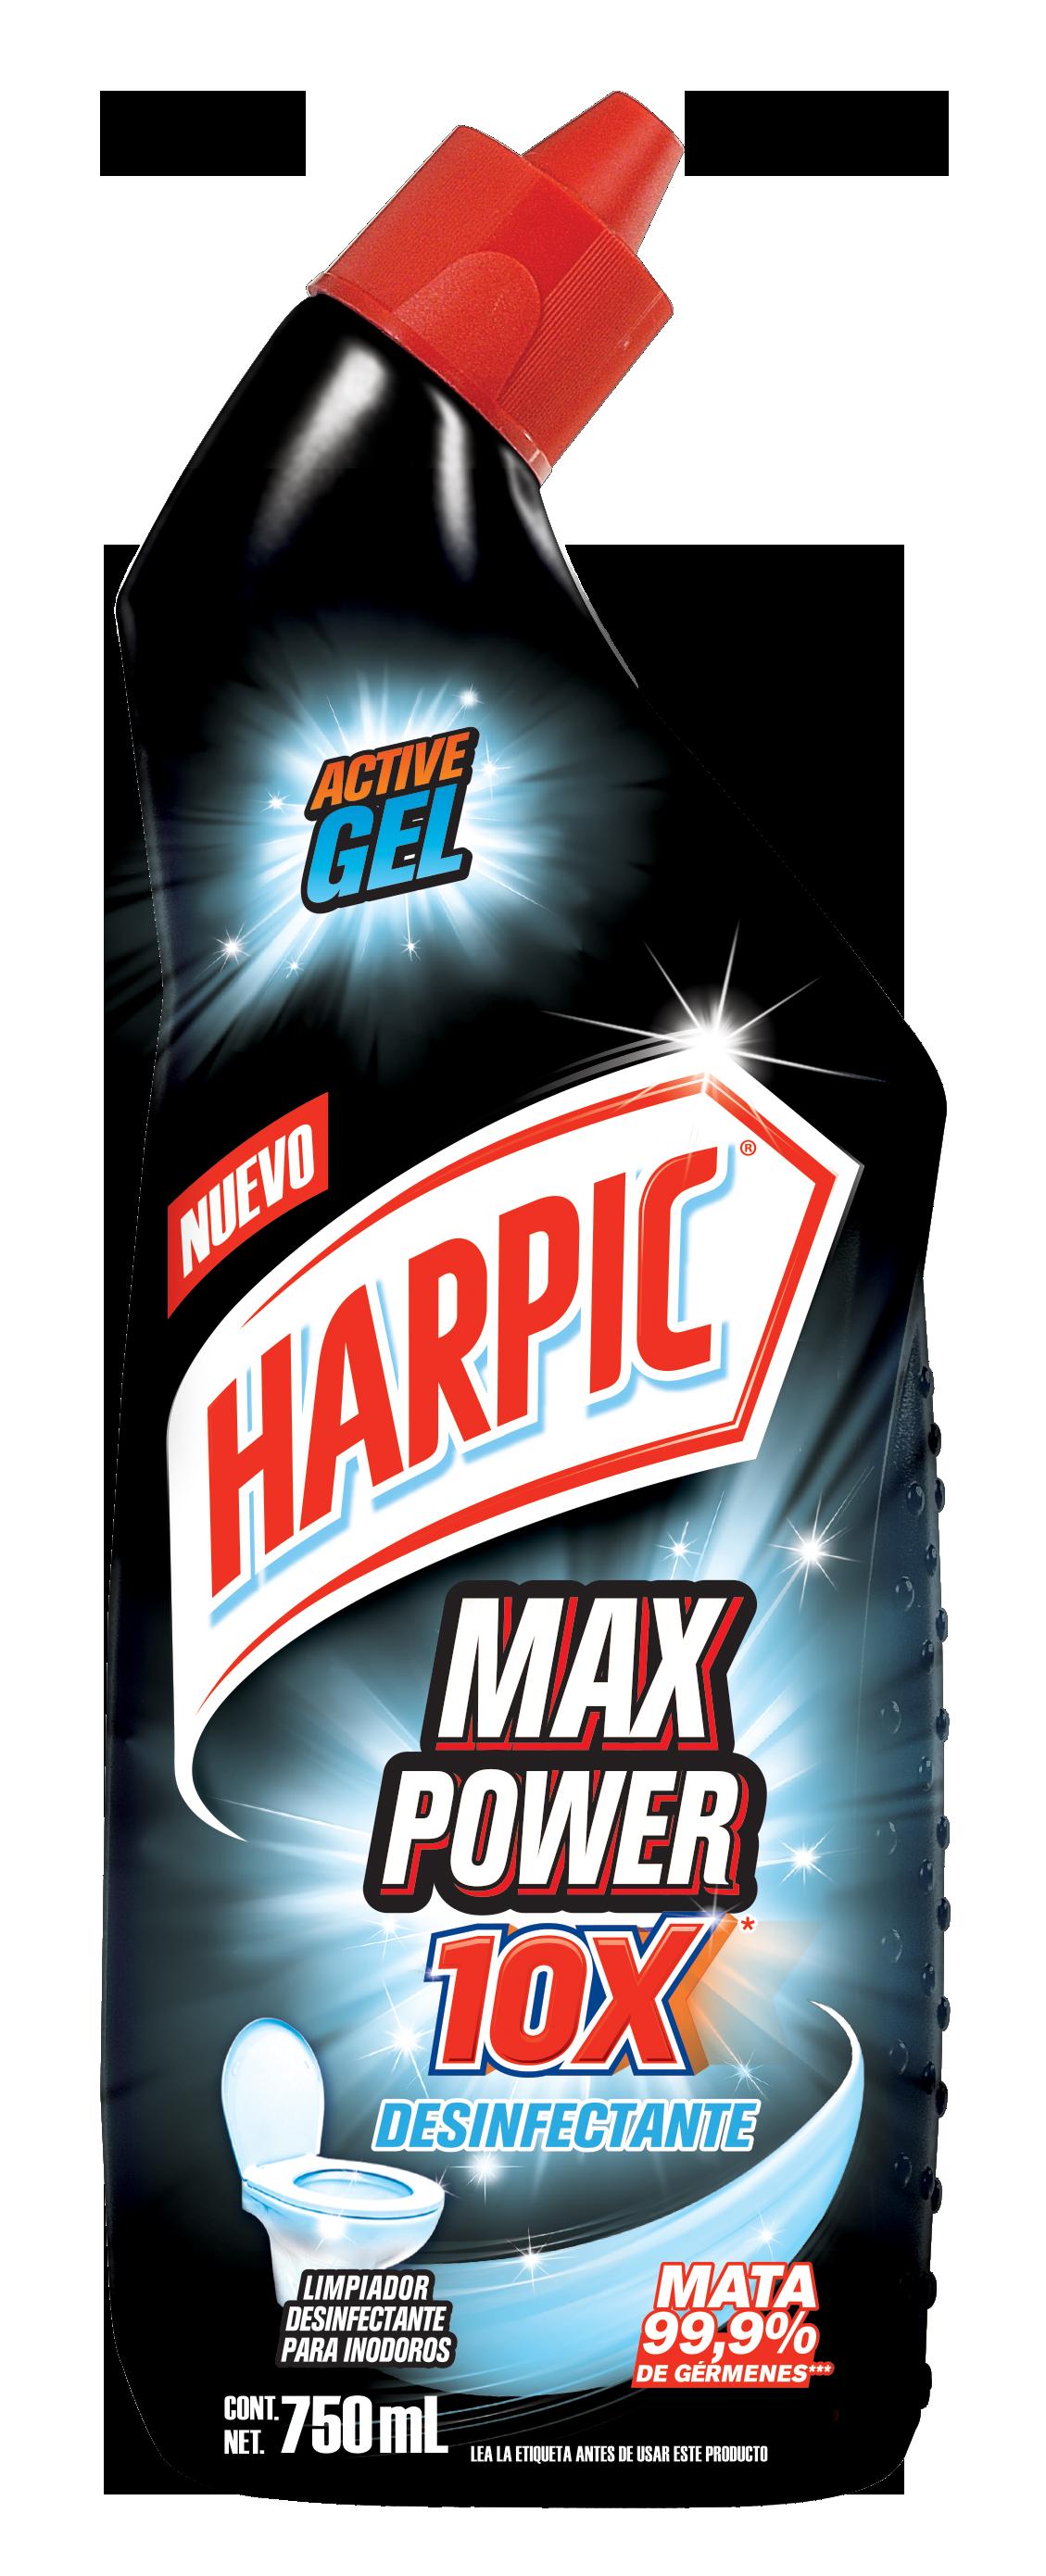 Harpic® Max Power 10x Desinfectante 750ml